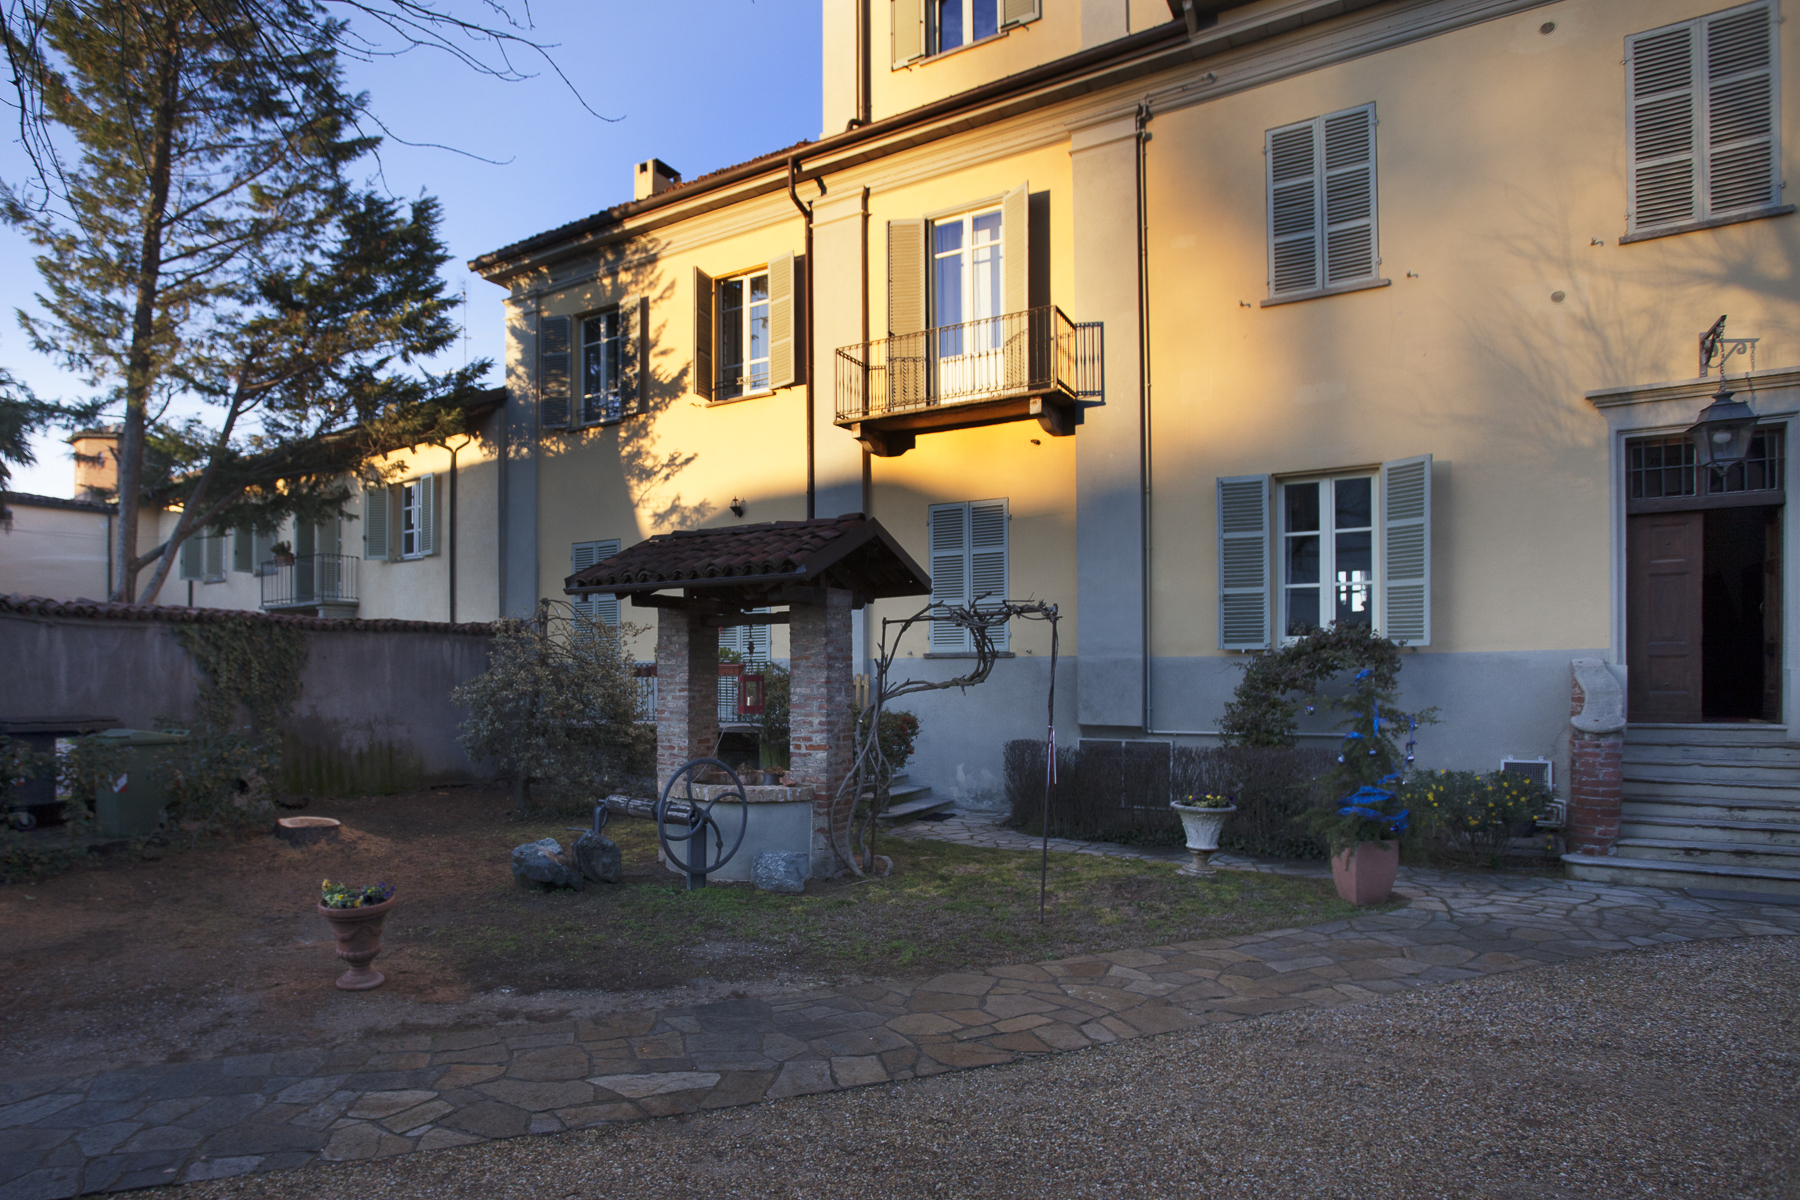 Appartement pour l Vente à Delightful apartment in Chieri Piazza Gerbido Autres Turin, Turin 10023 Italie